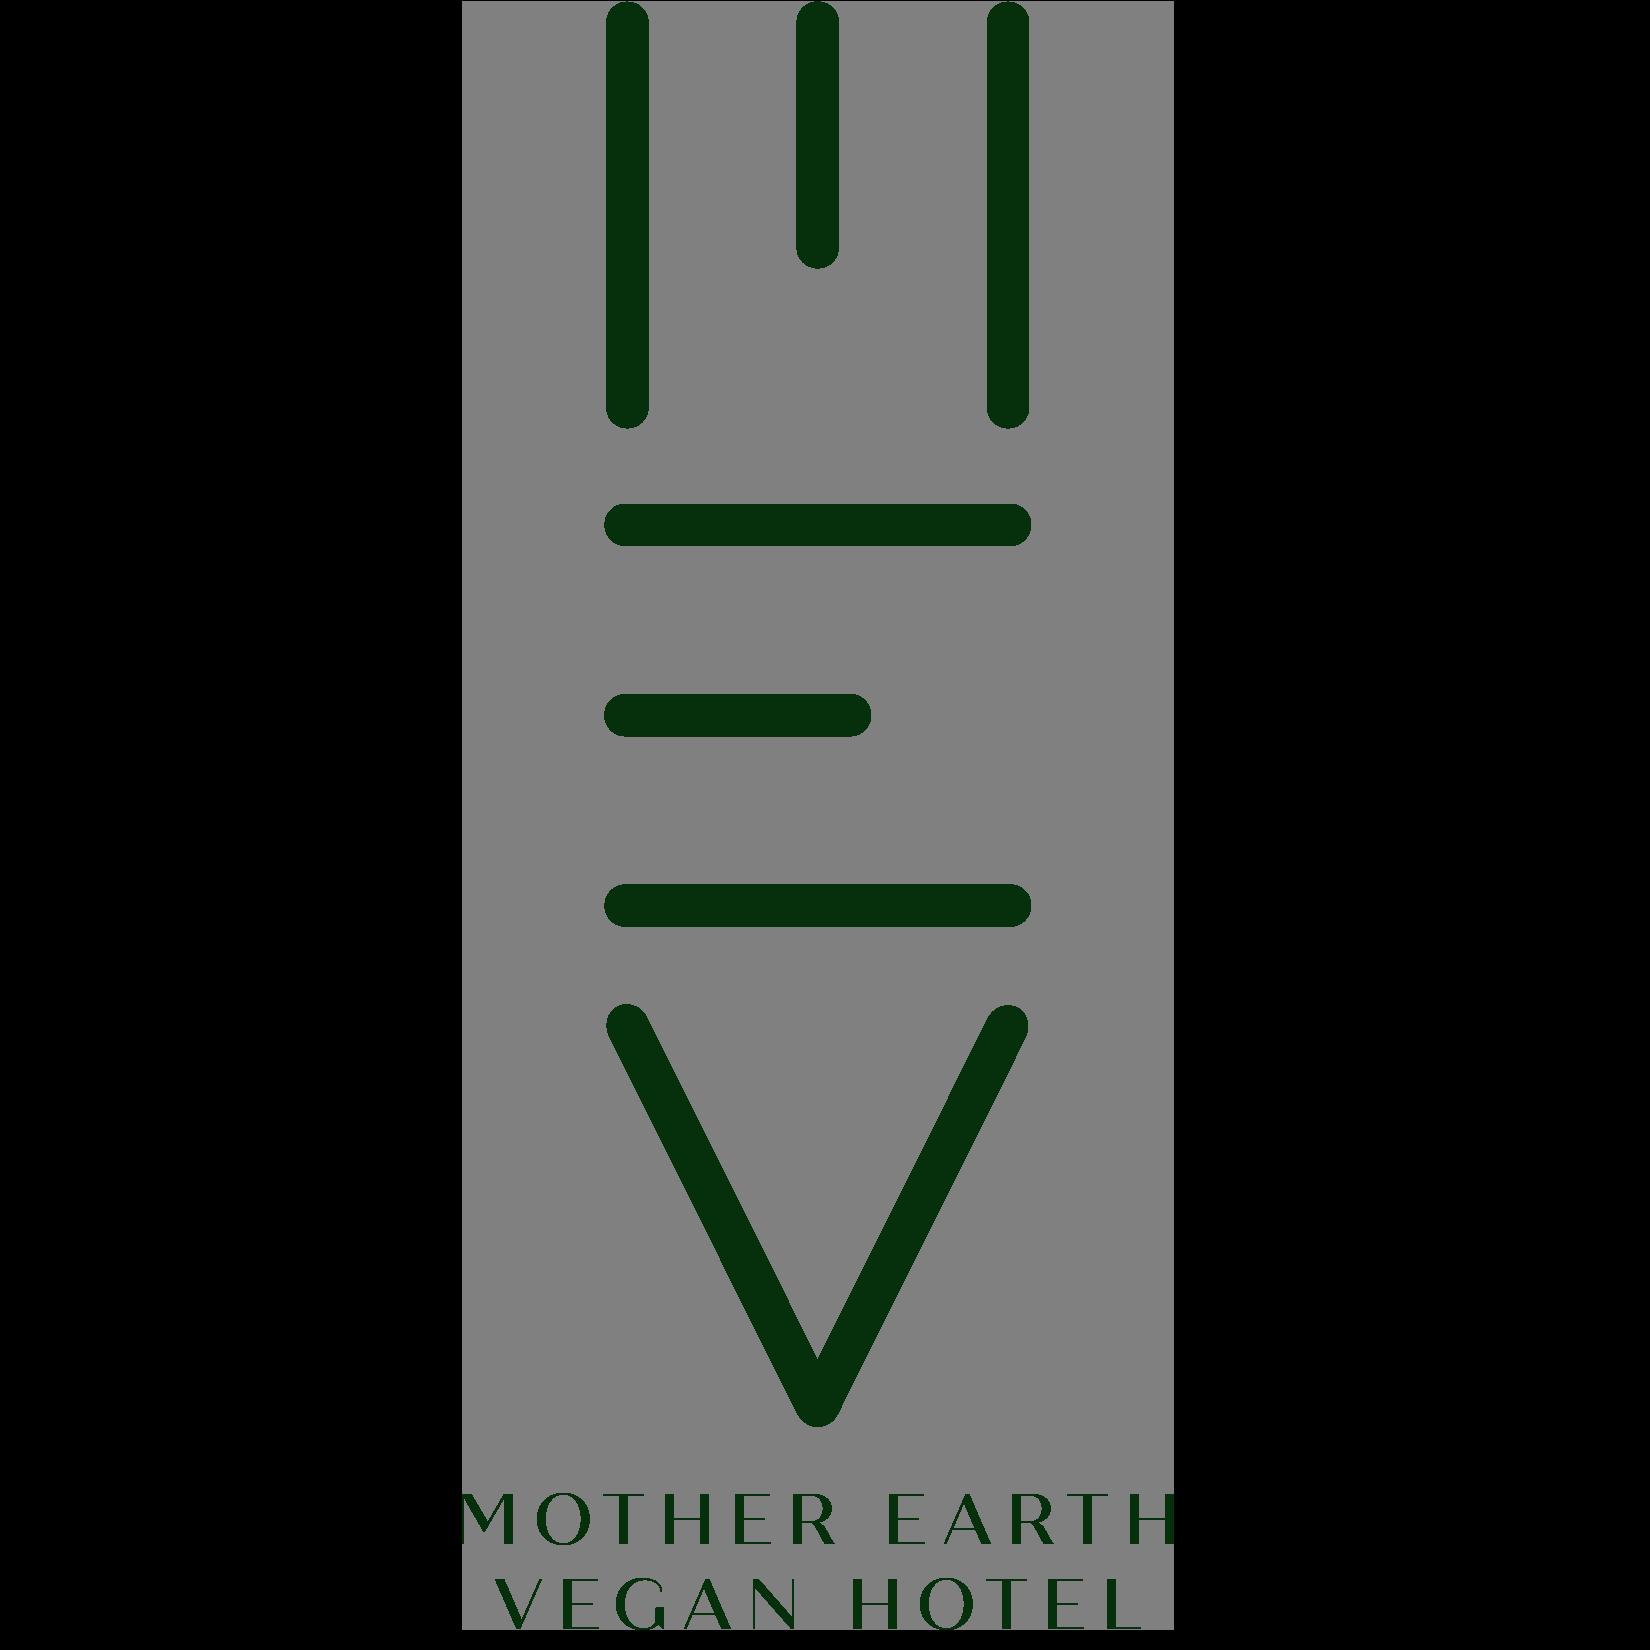 Mother Earth Vegan Hotel